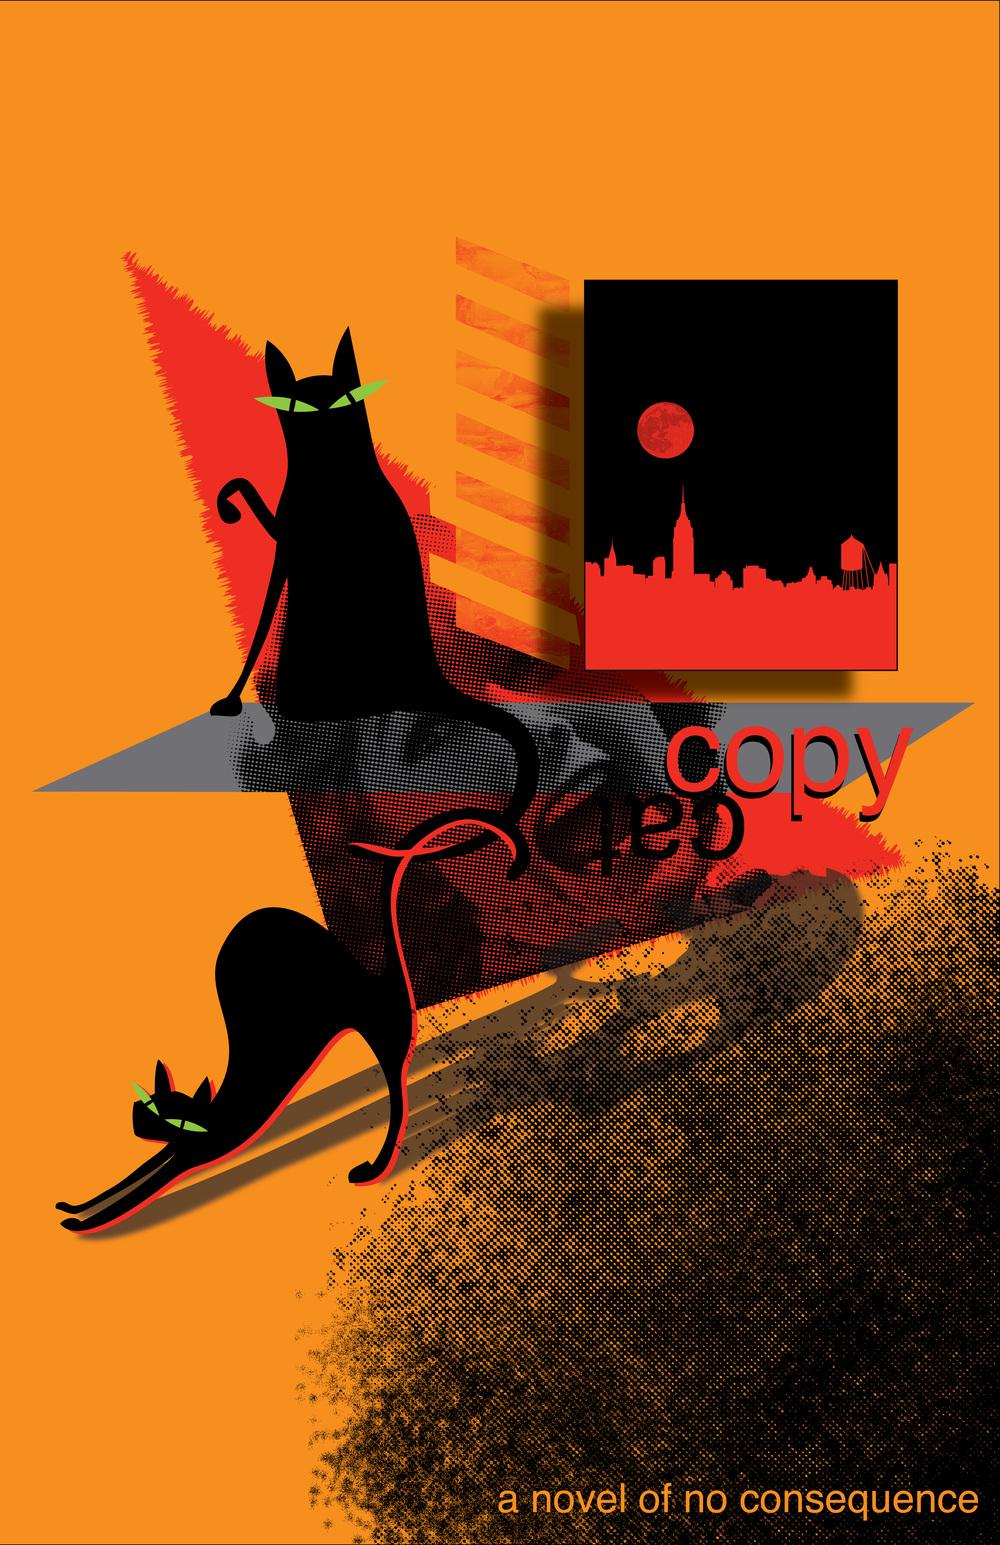 copycatcover-01.jpg